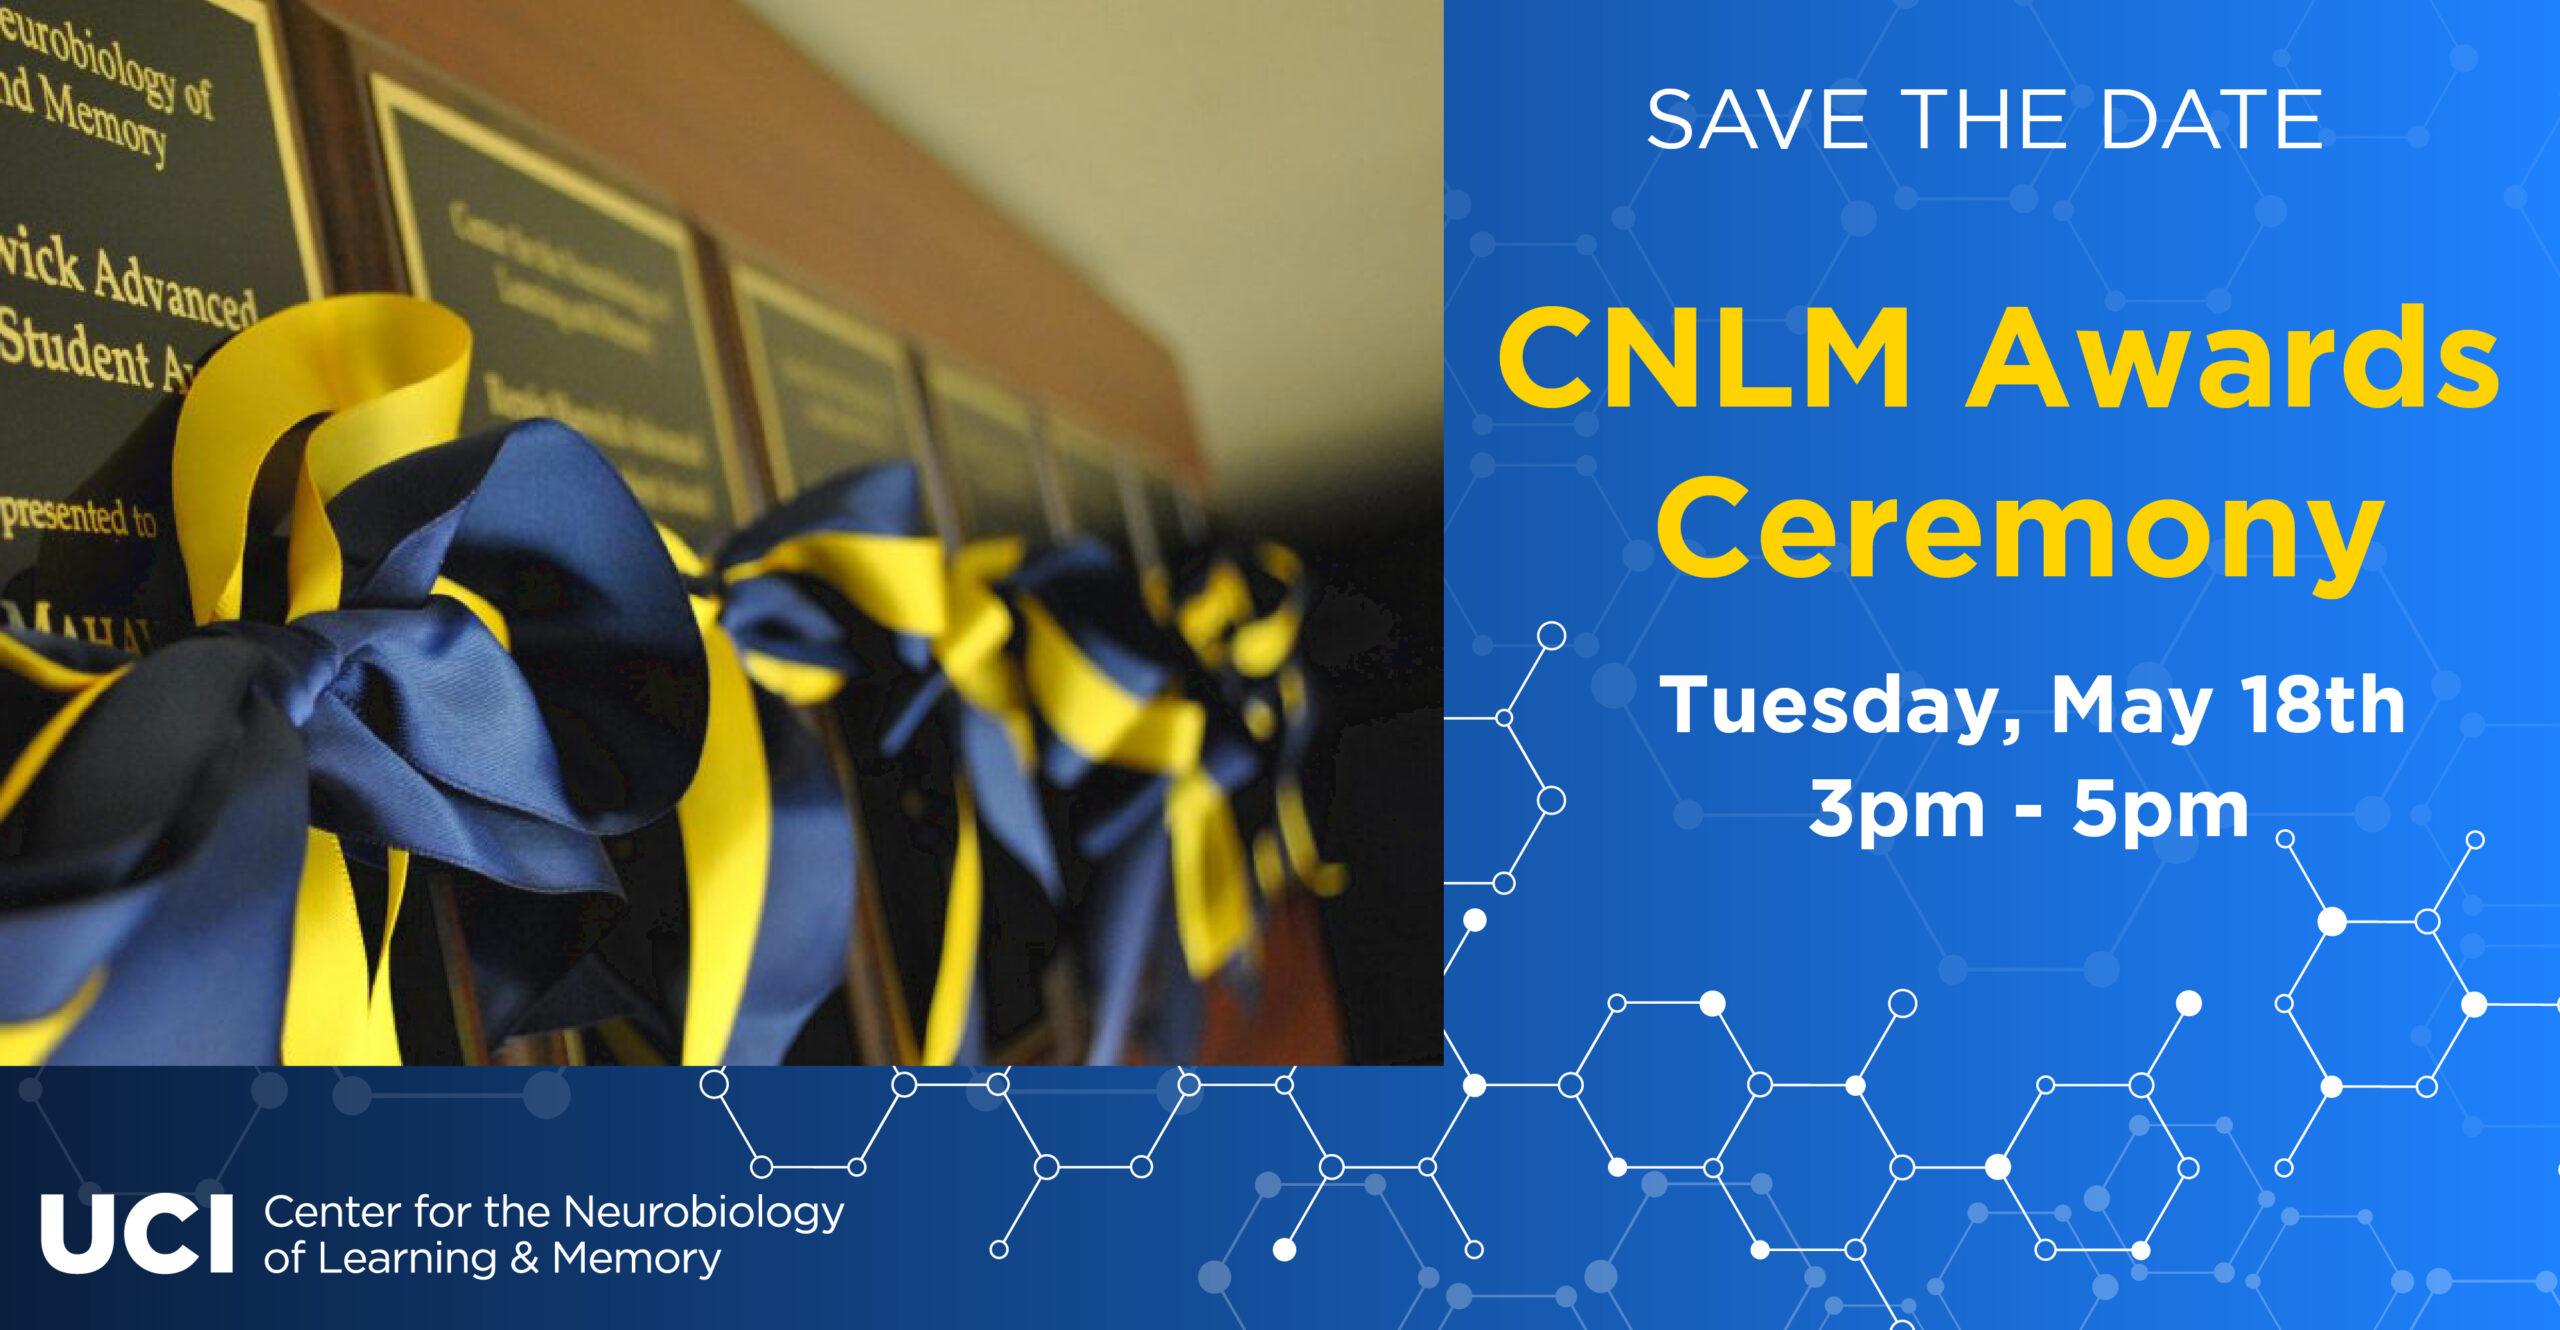 CNLM Awards Ceremony